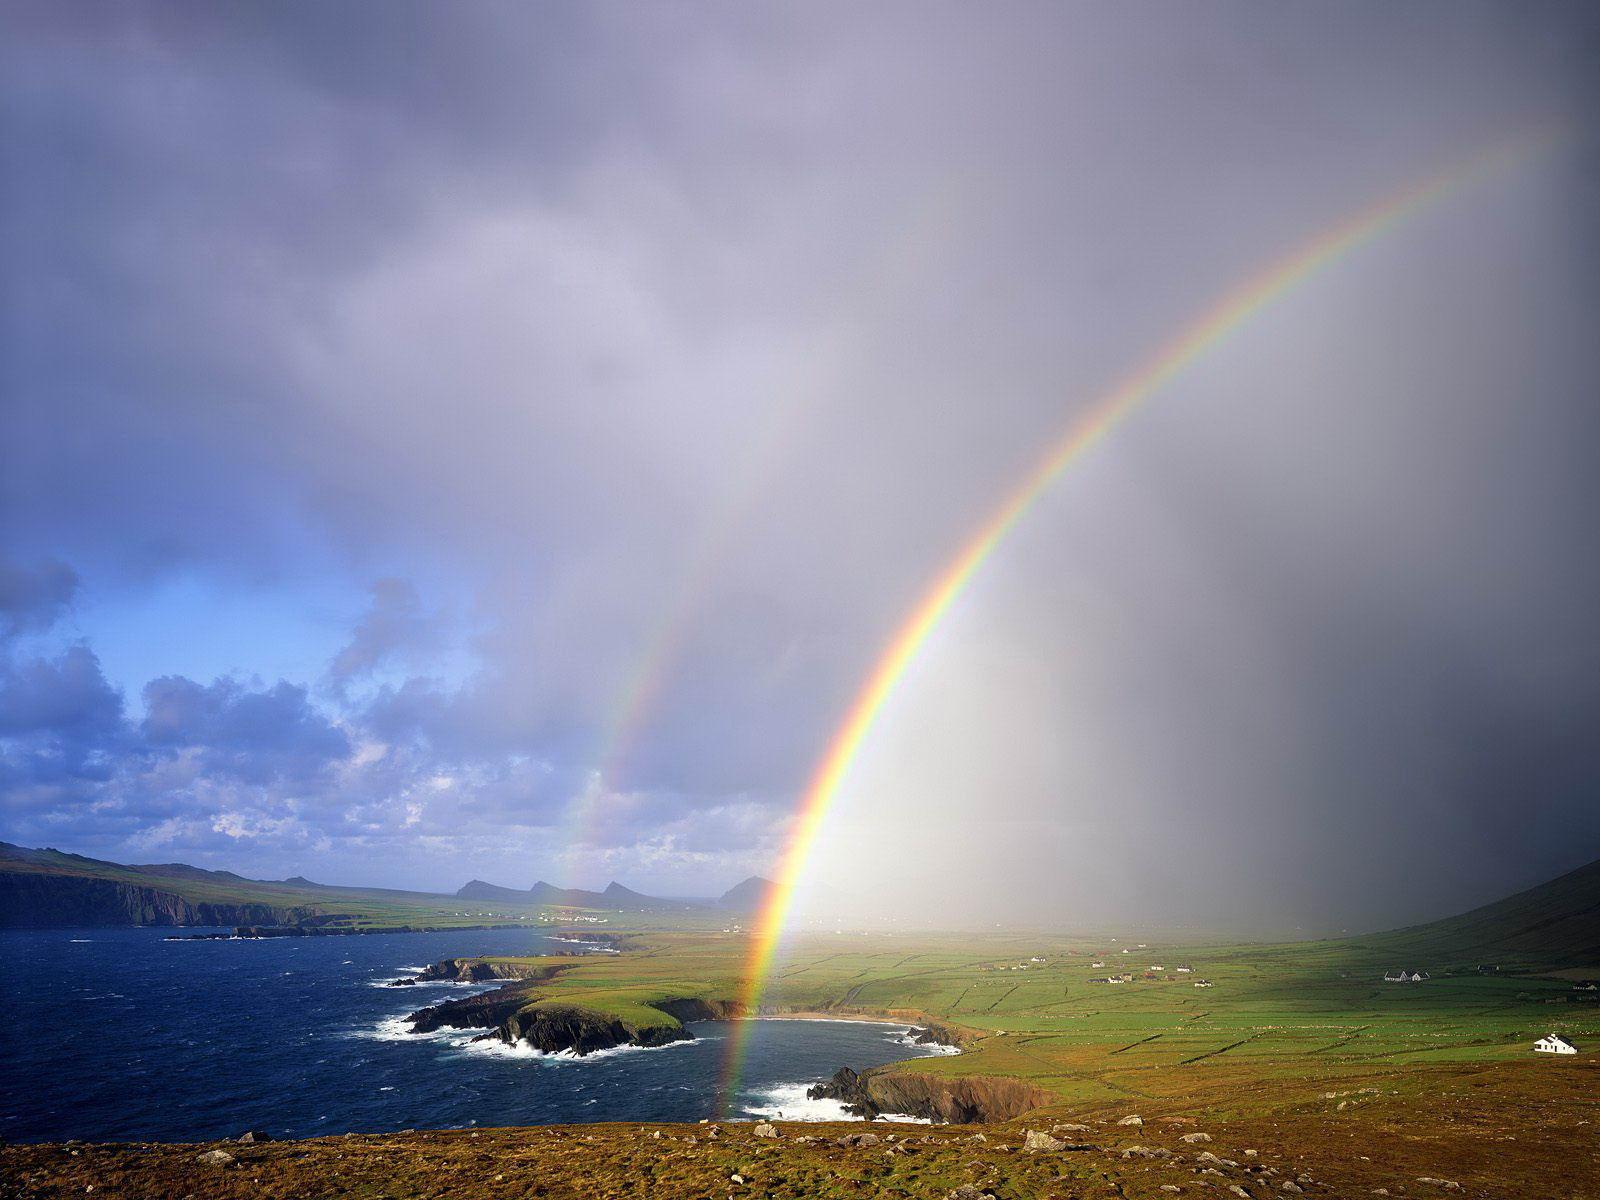 Rainbow Wallpaper Desktop: Rainbow Wallpapers Hd